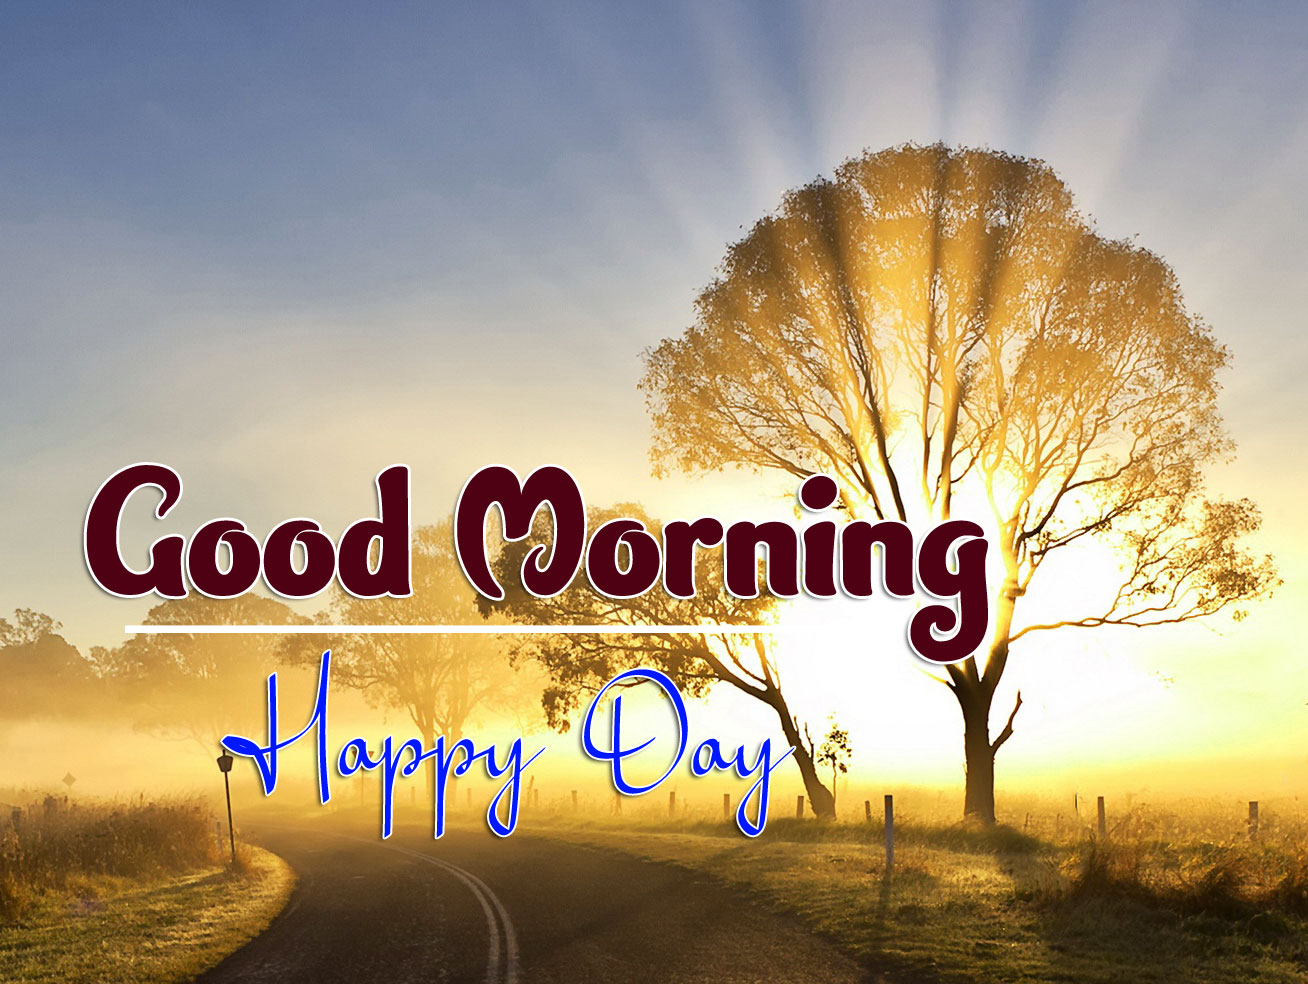 beautiful good morning images wallpaper hd download